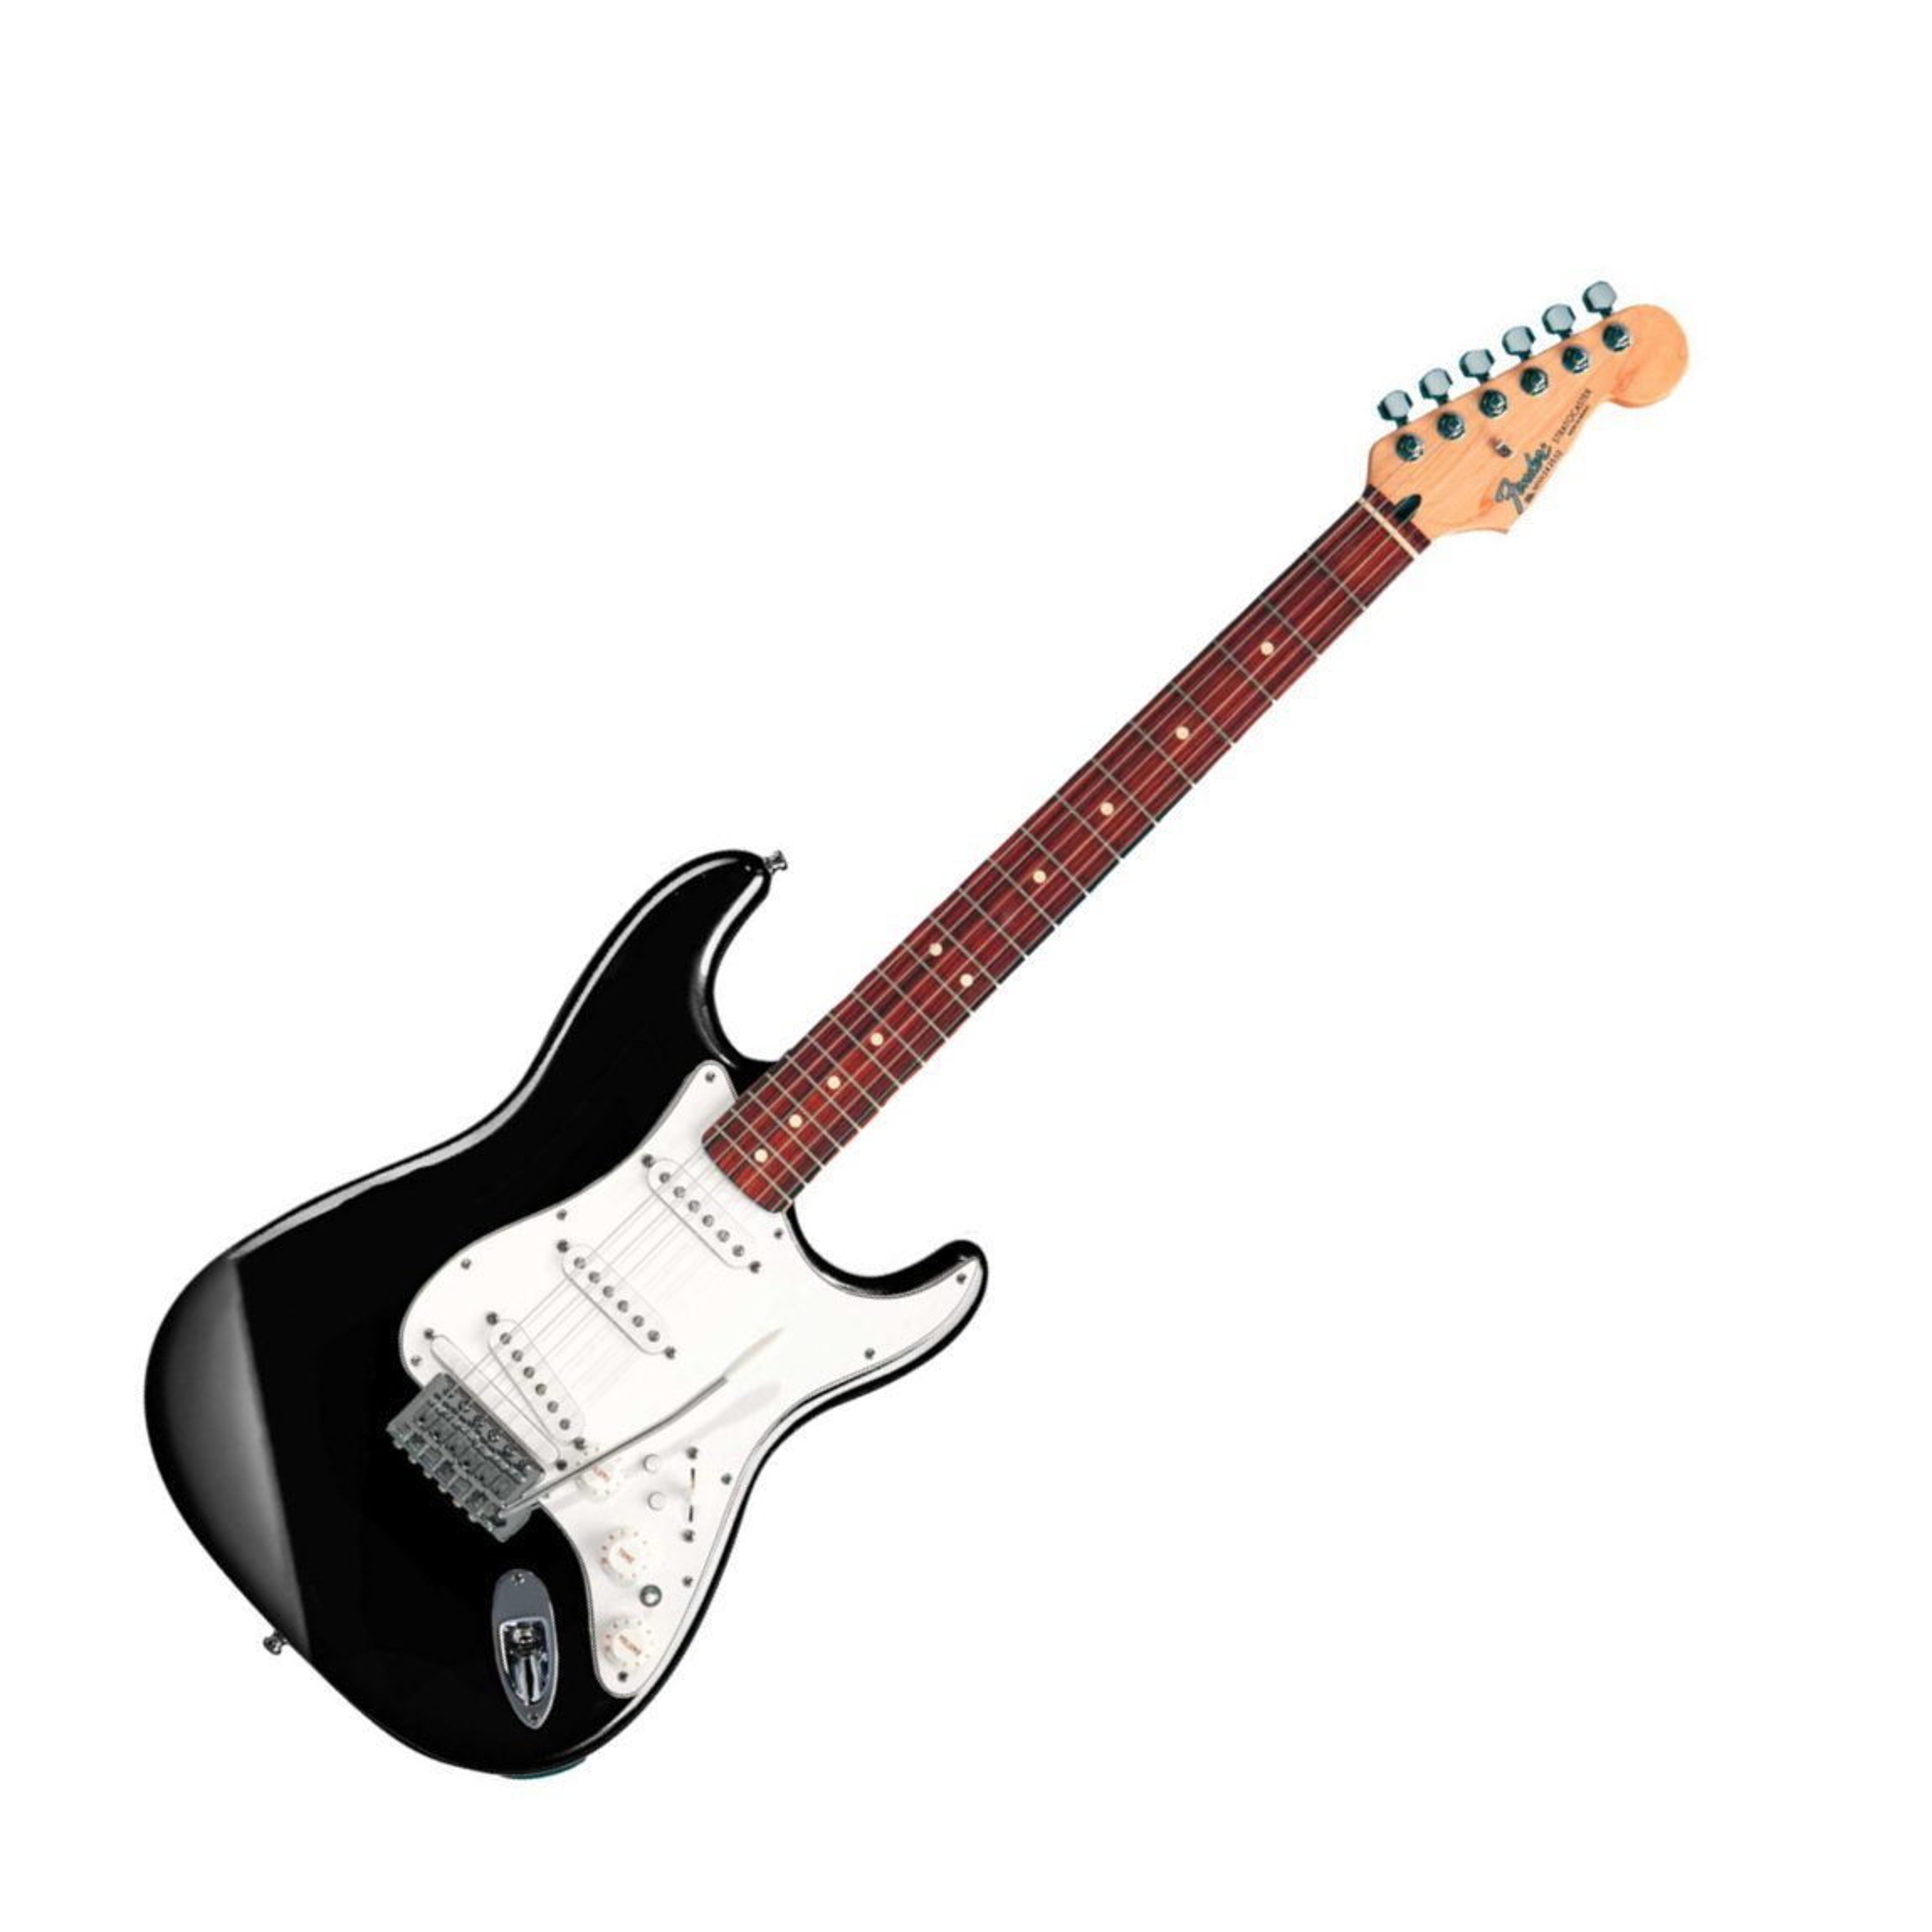 Fender Stratocaster Standard – STANDARD ROLAND READY STRATOCASTER Guitar Review